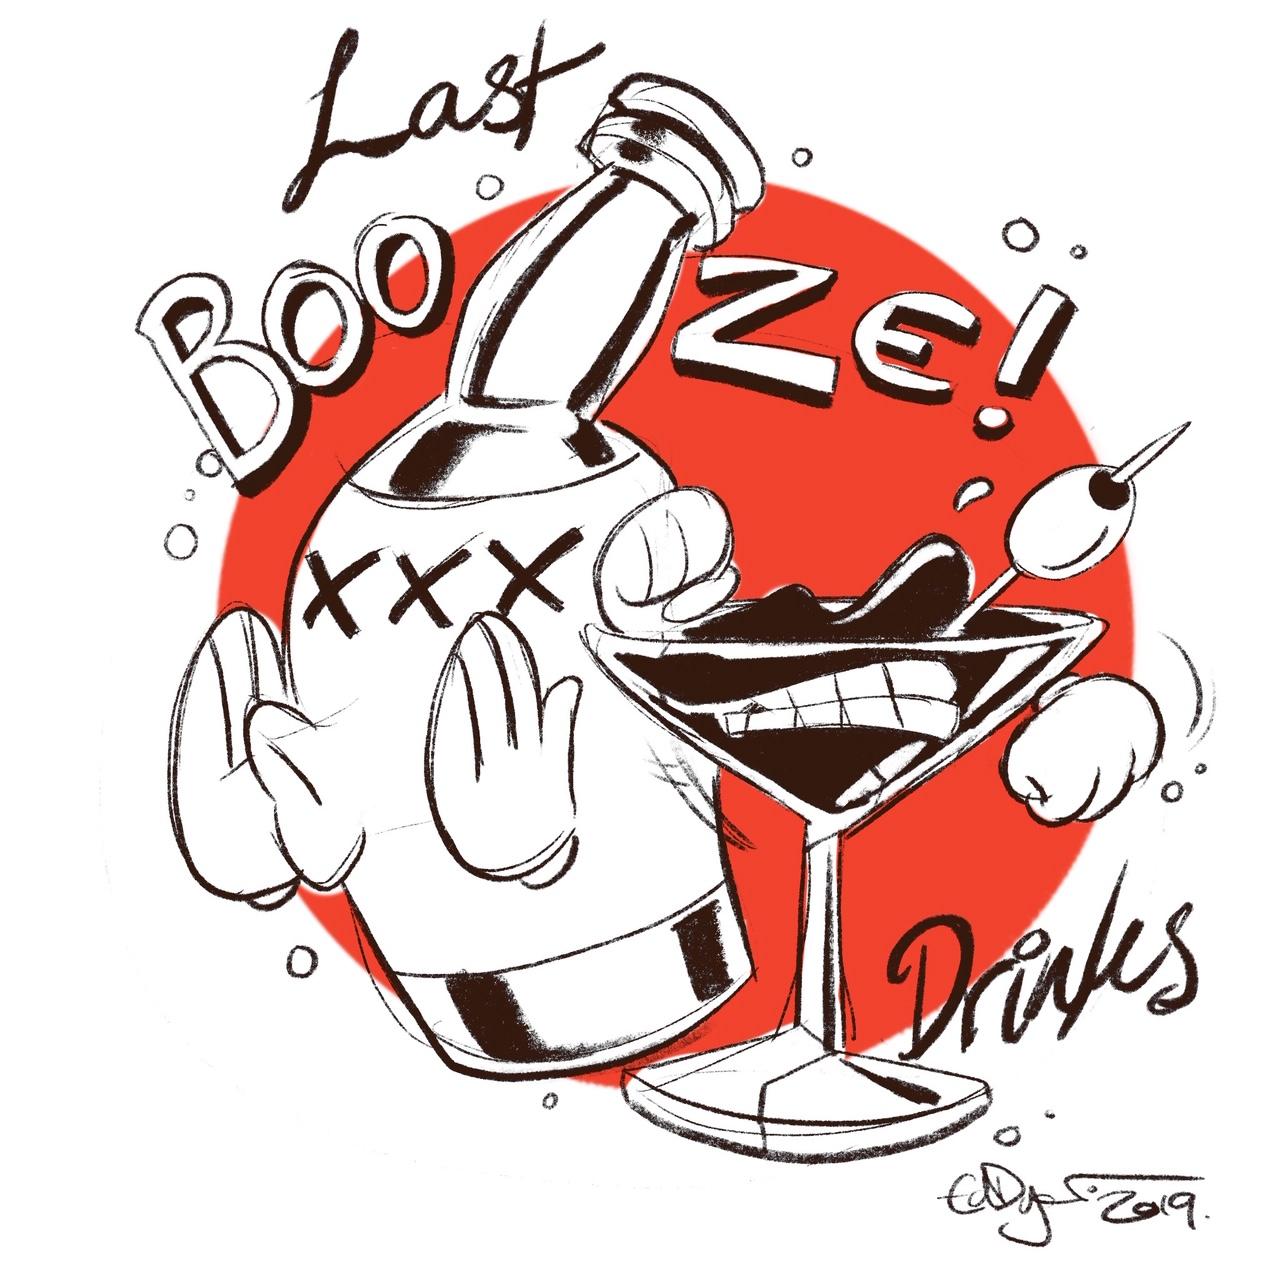 BOOZE LAST DRINKS